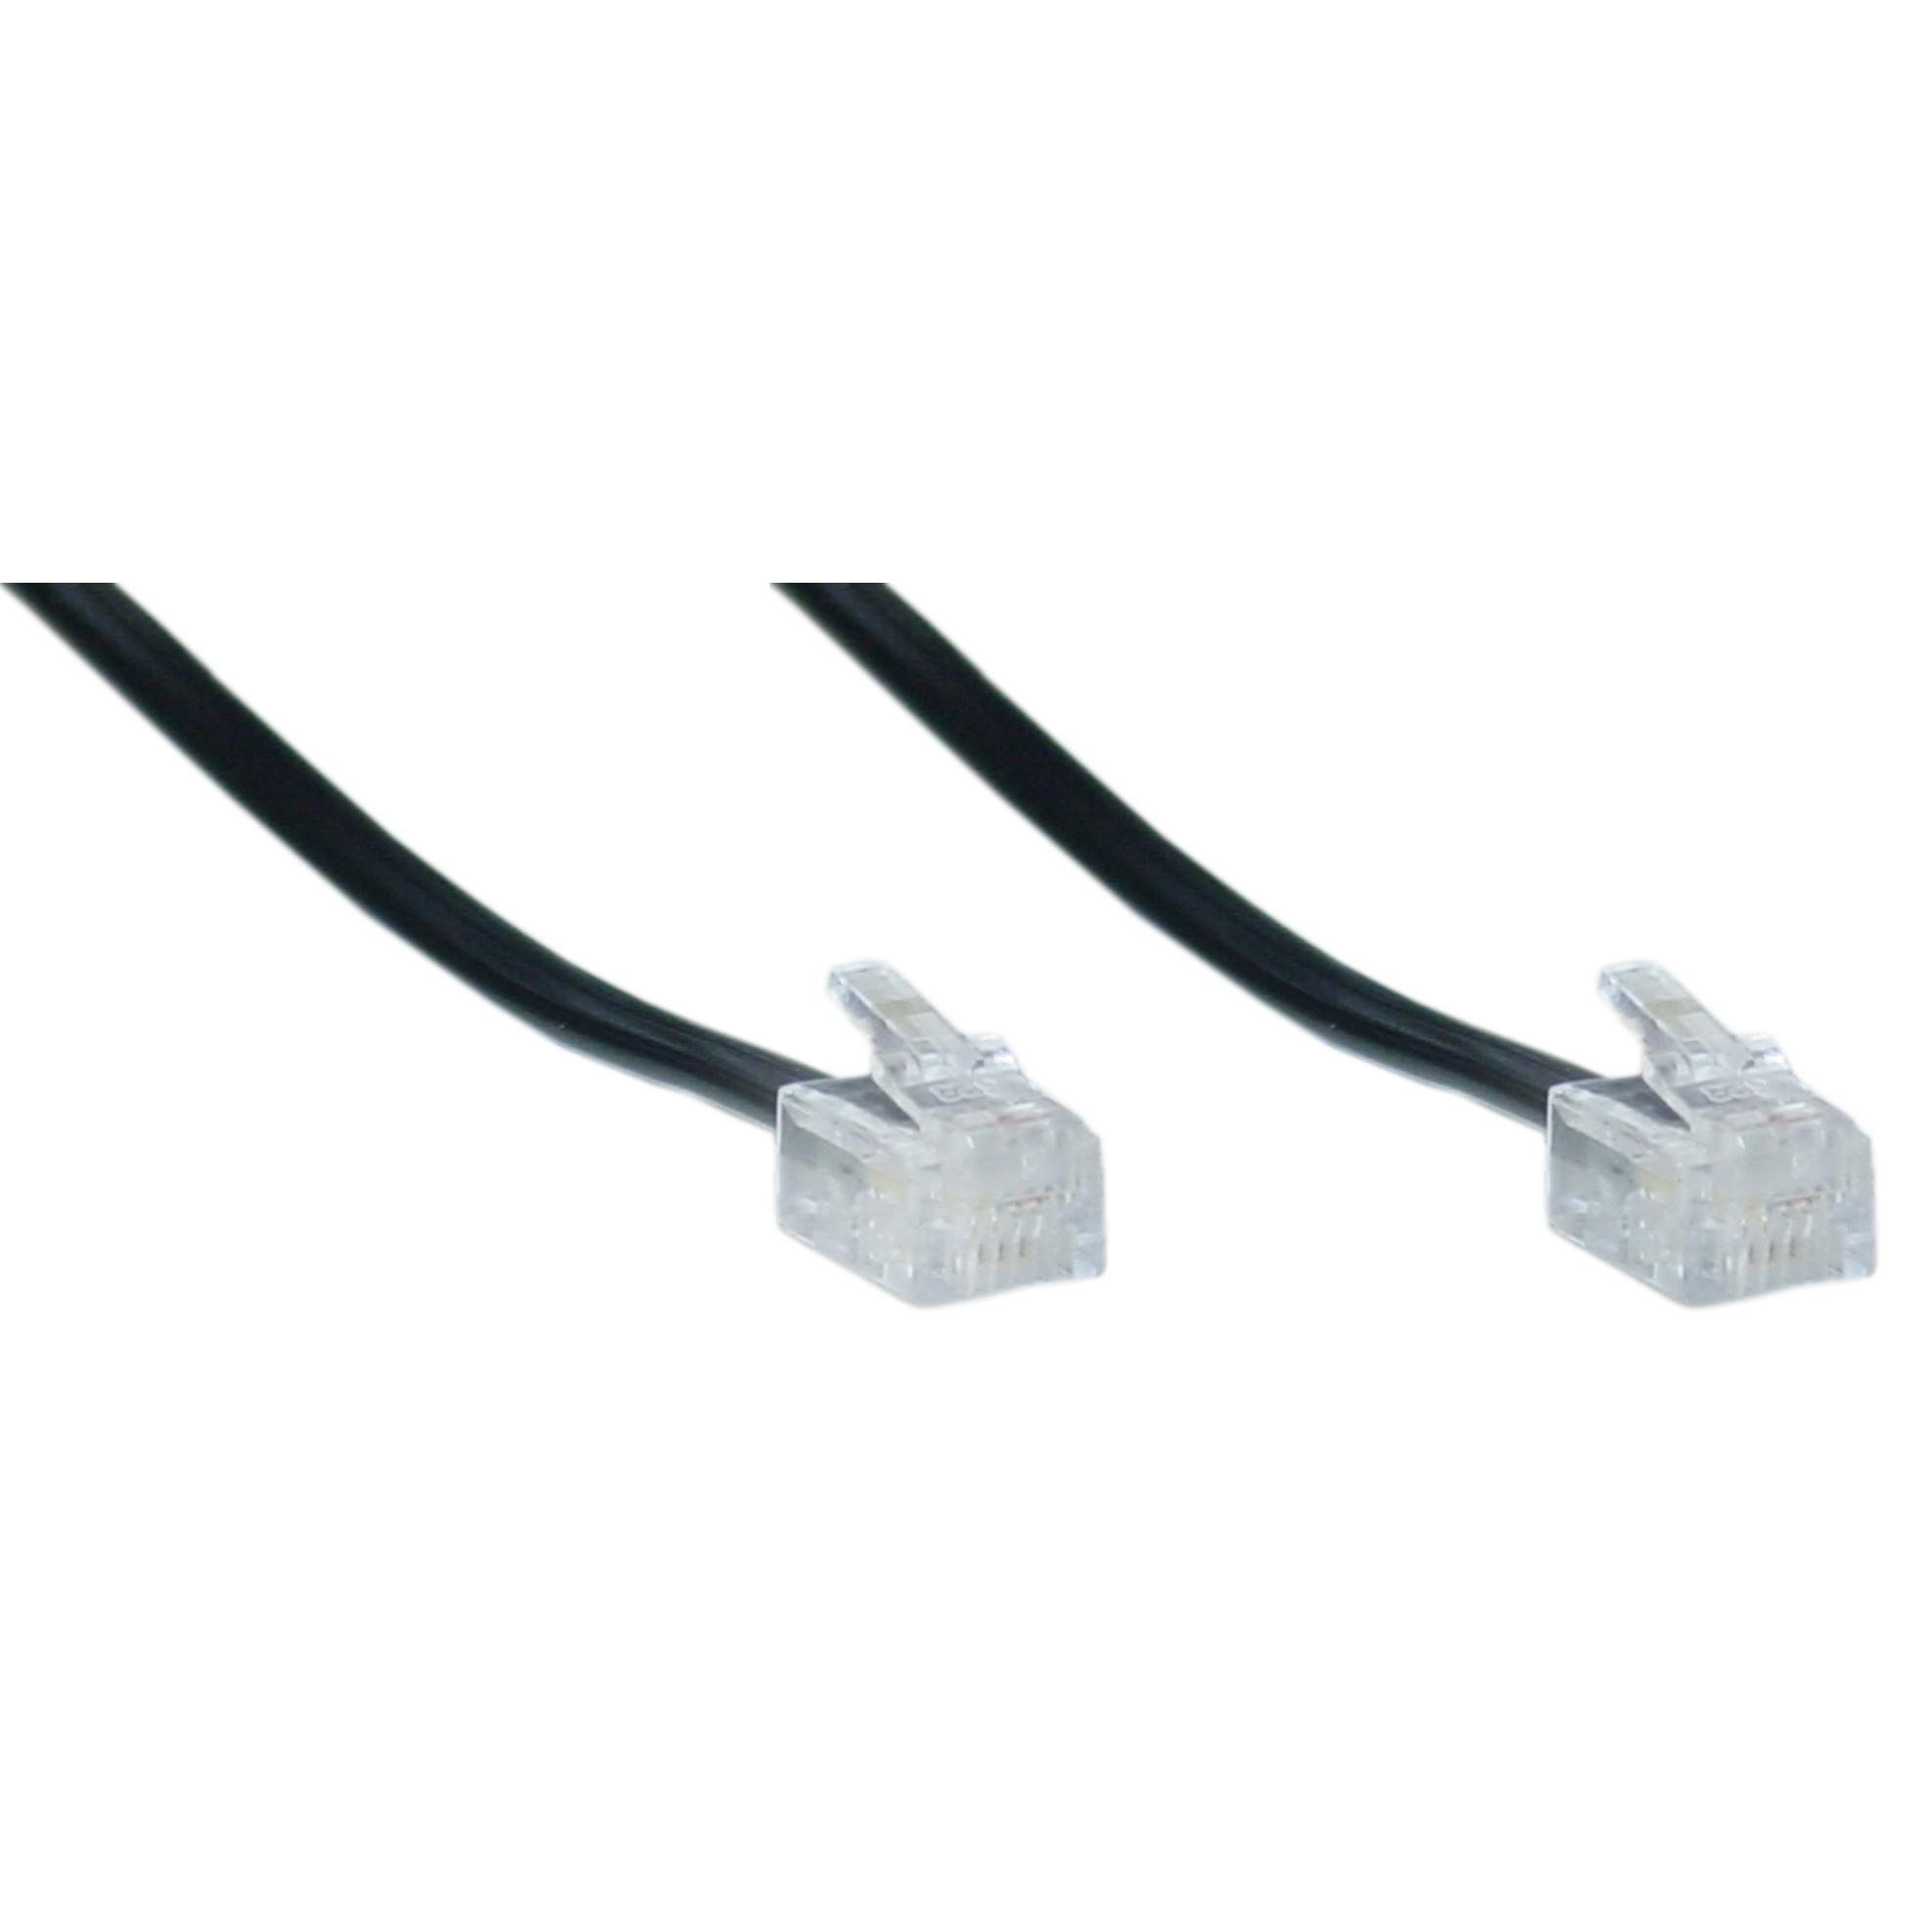 hight resolution of telephone cord voice rj11 6p 4c black reverse